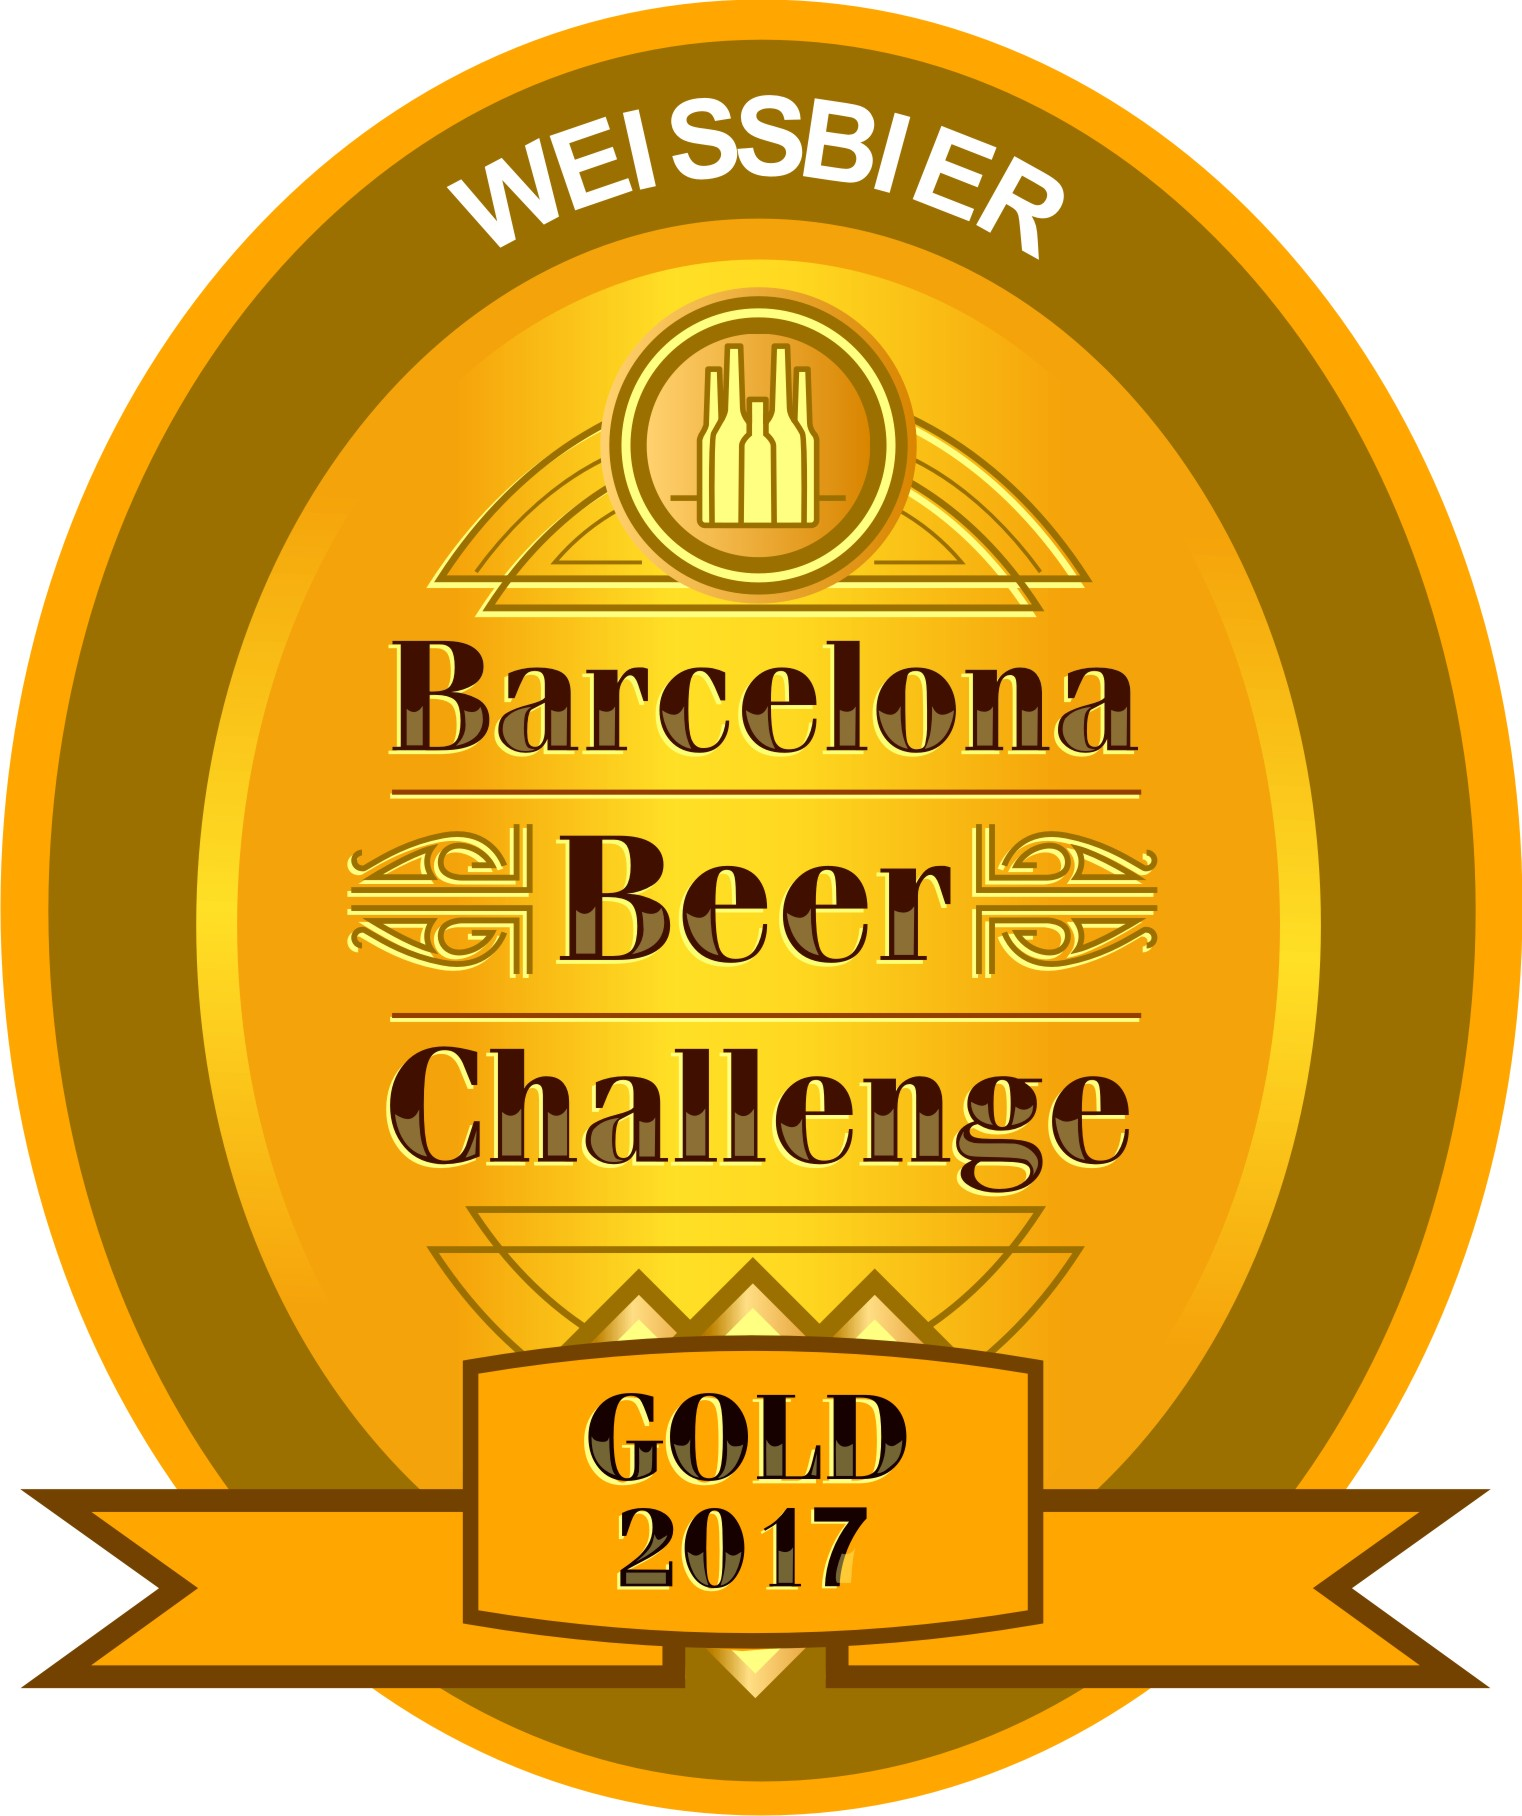 http://primator.cz/wp-content/uploads/2018/03/BarcelonaBCH_gold_W.jpg